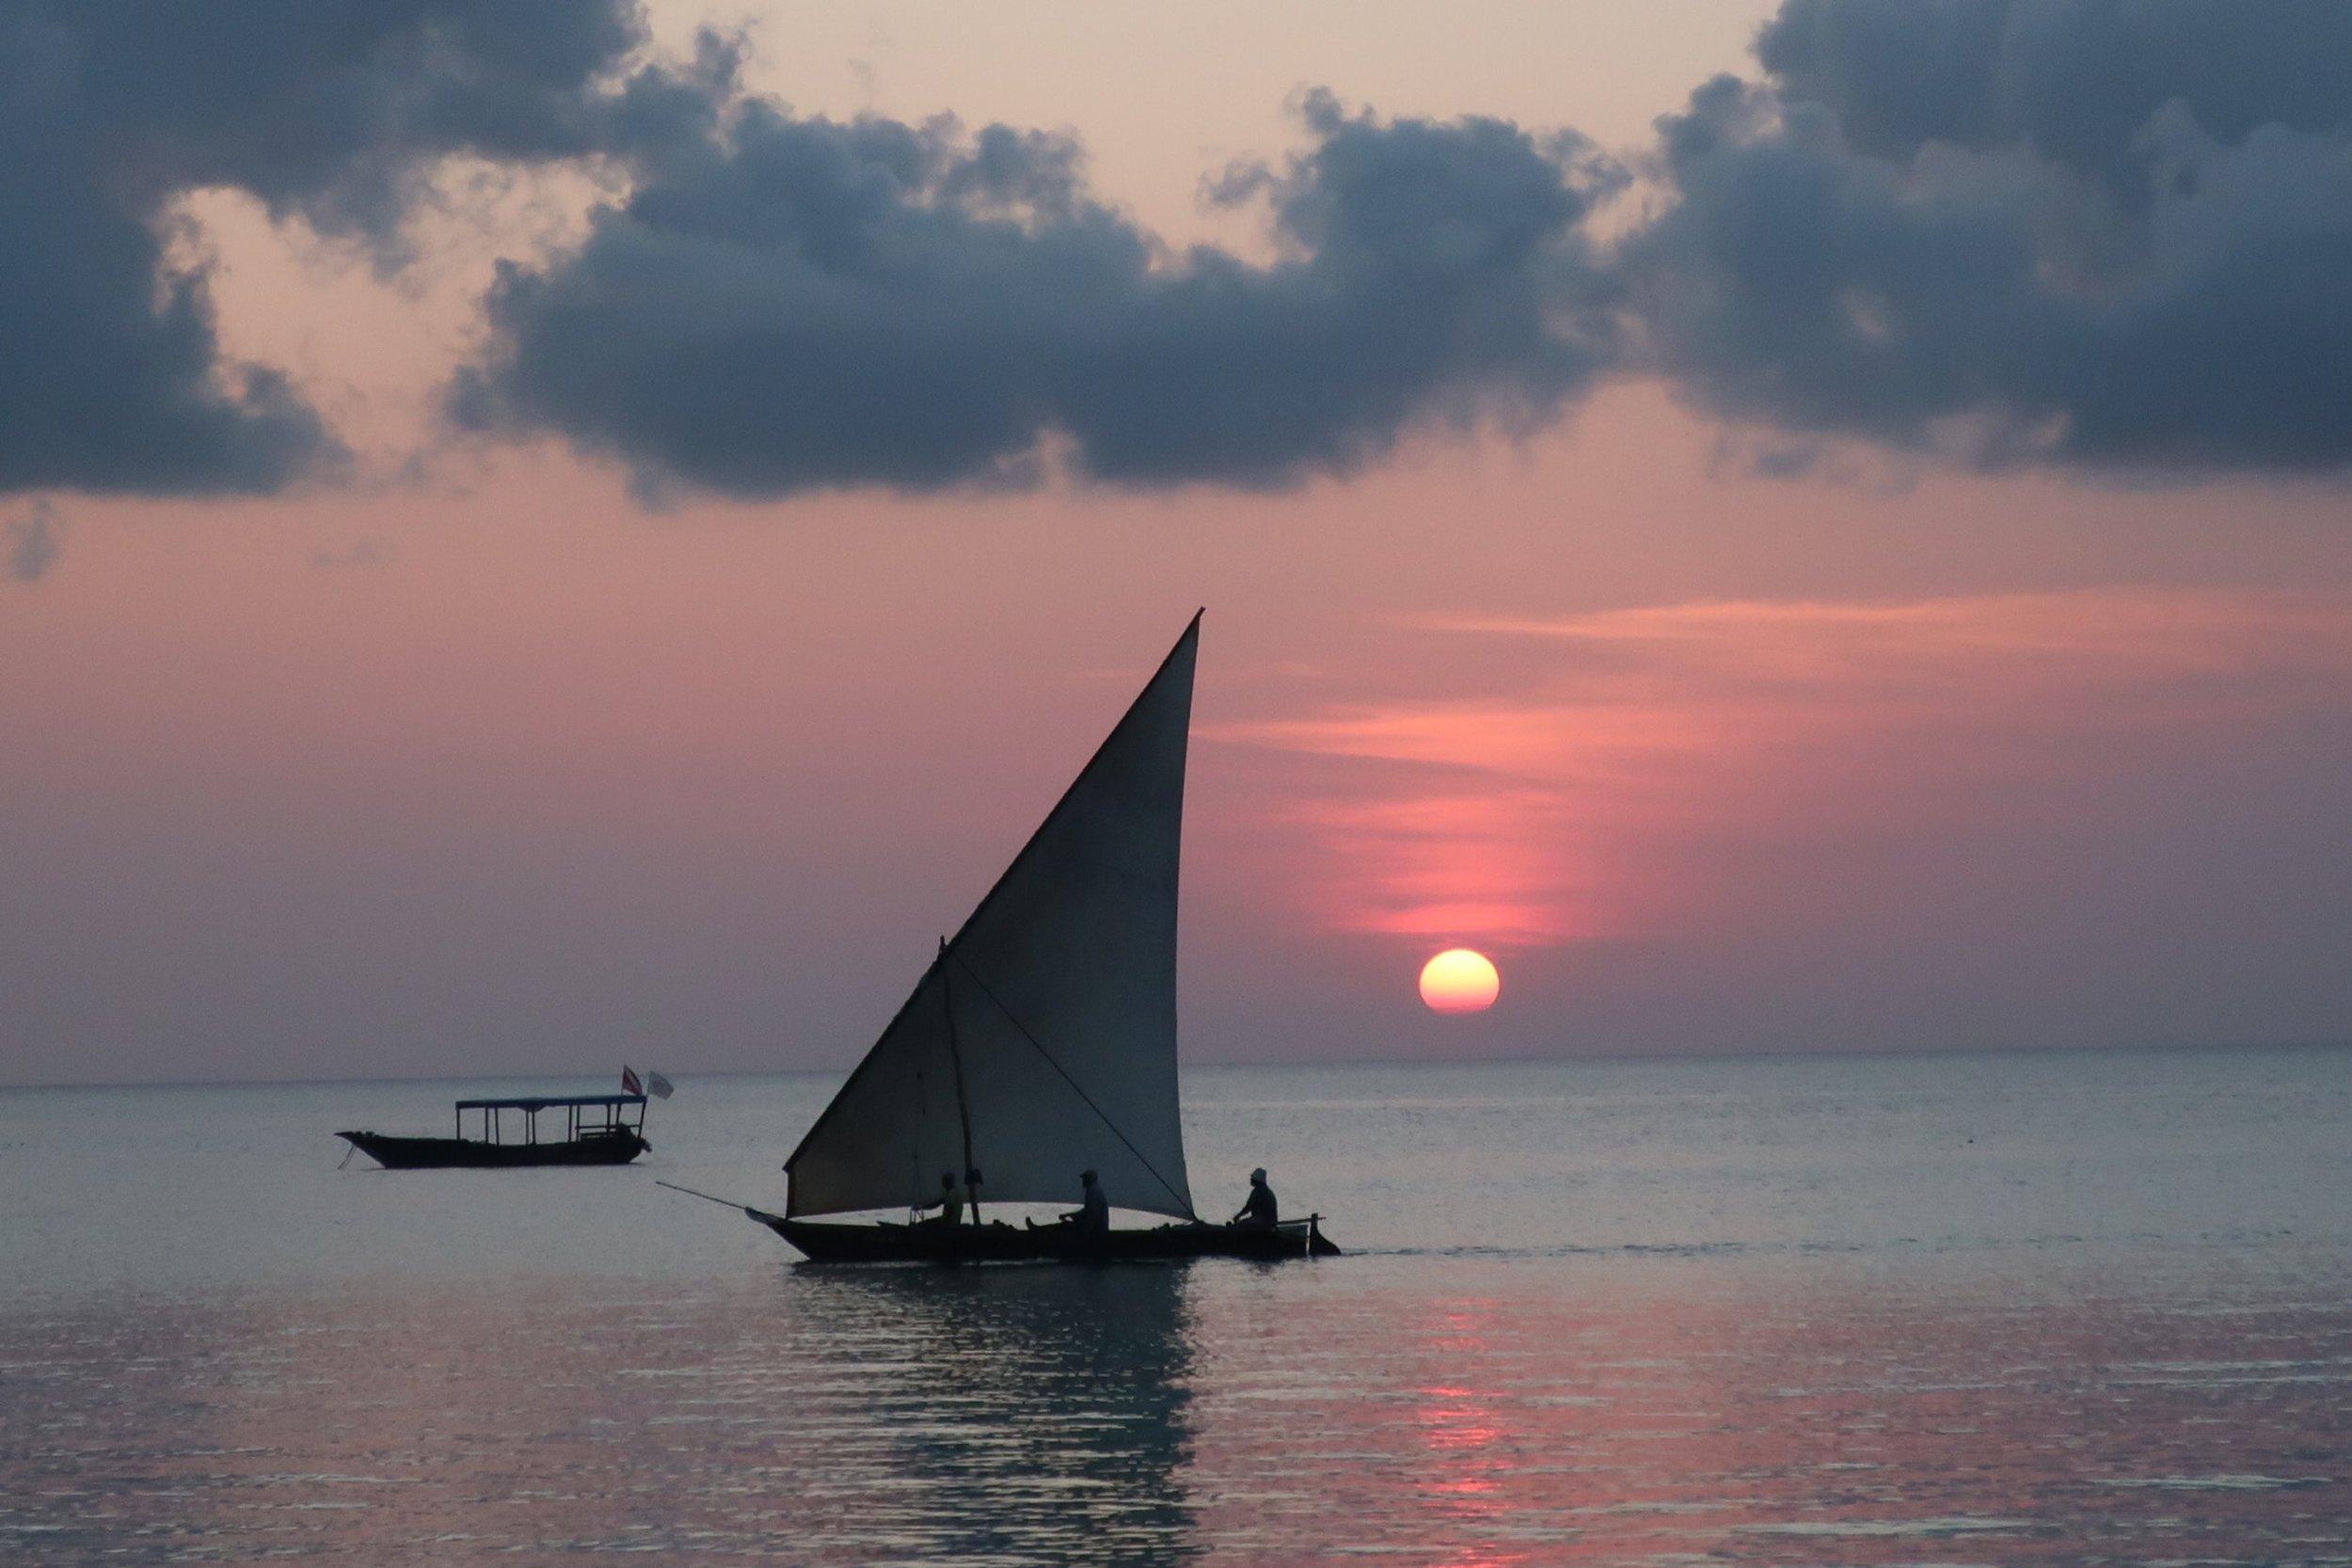 sail boat--Holy Soirit wind in ny sails.jpeg